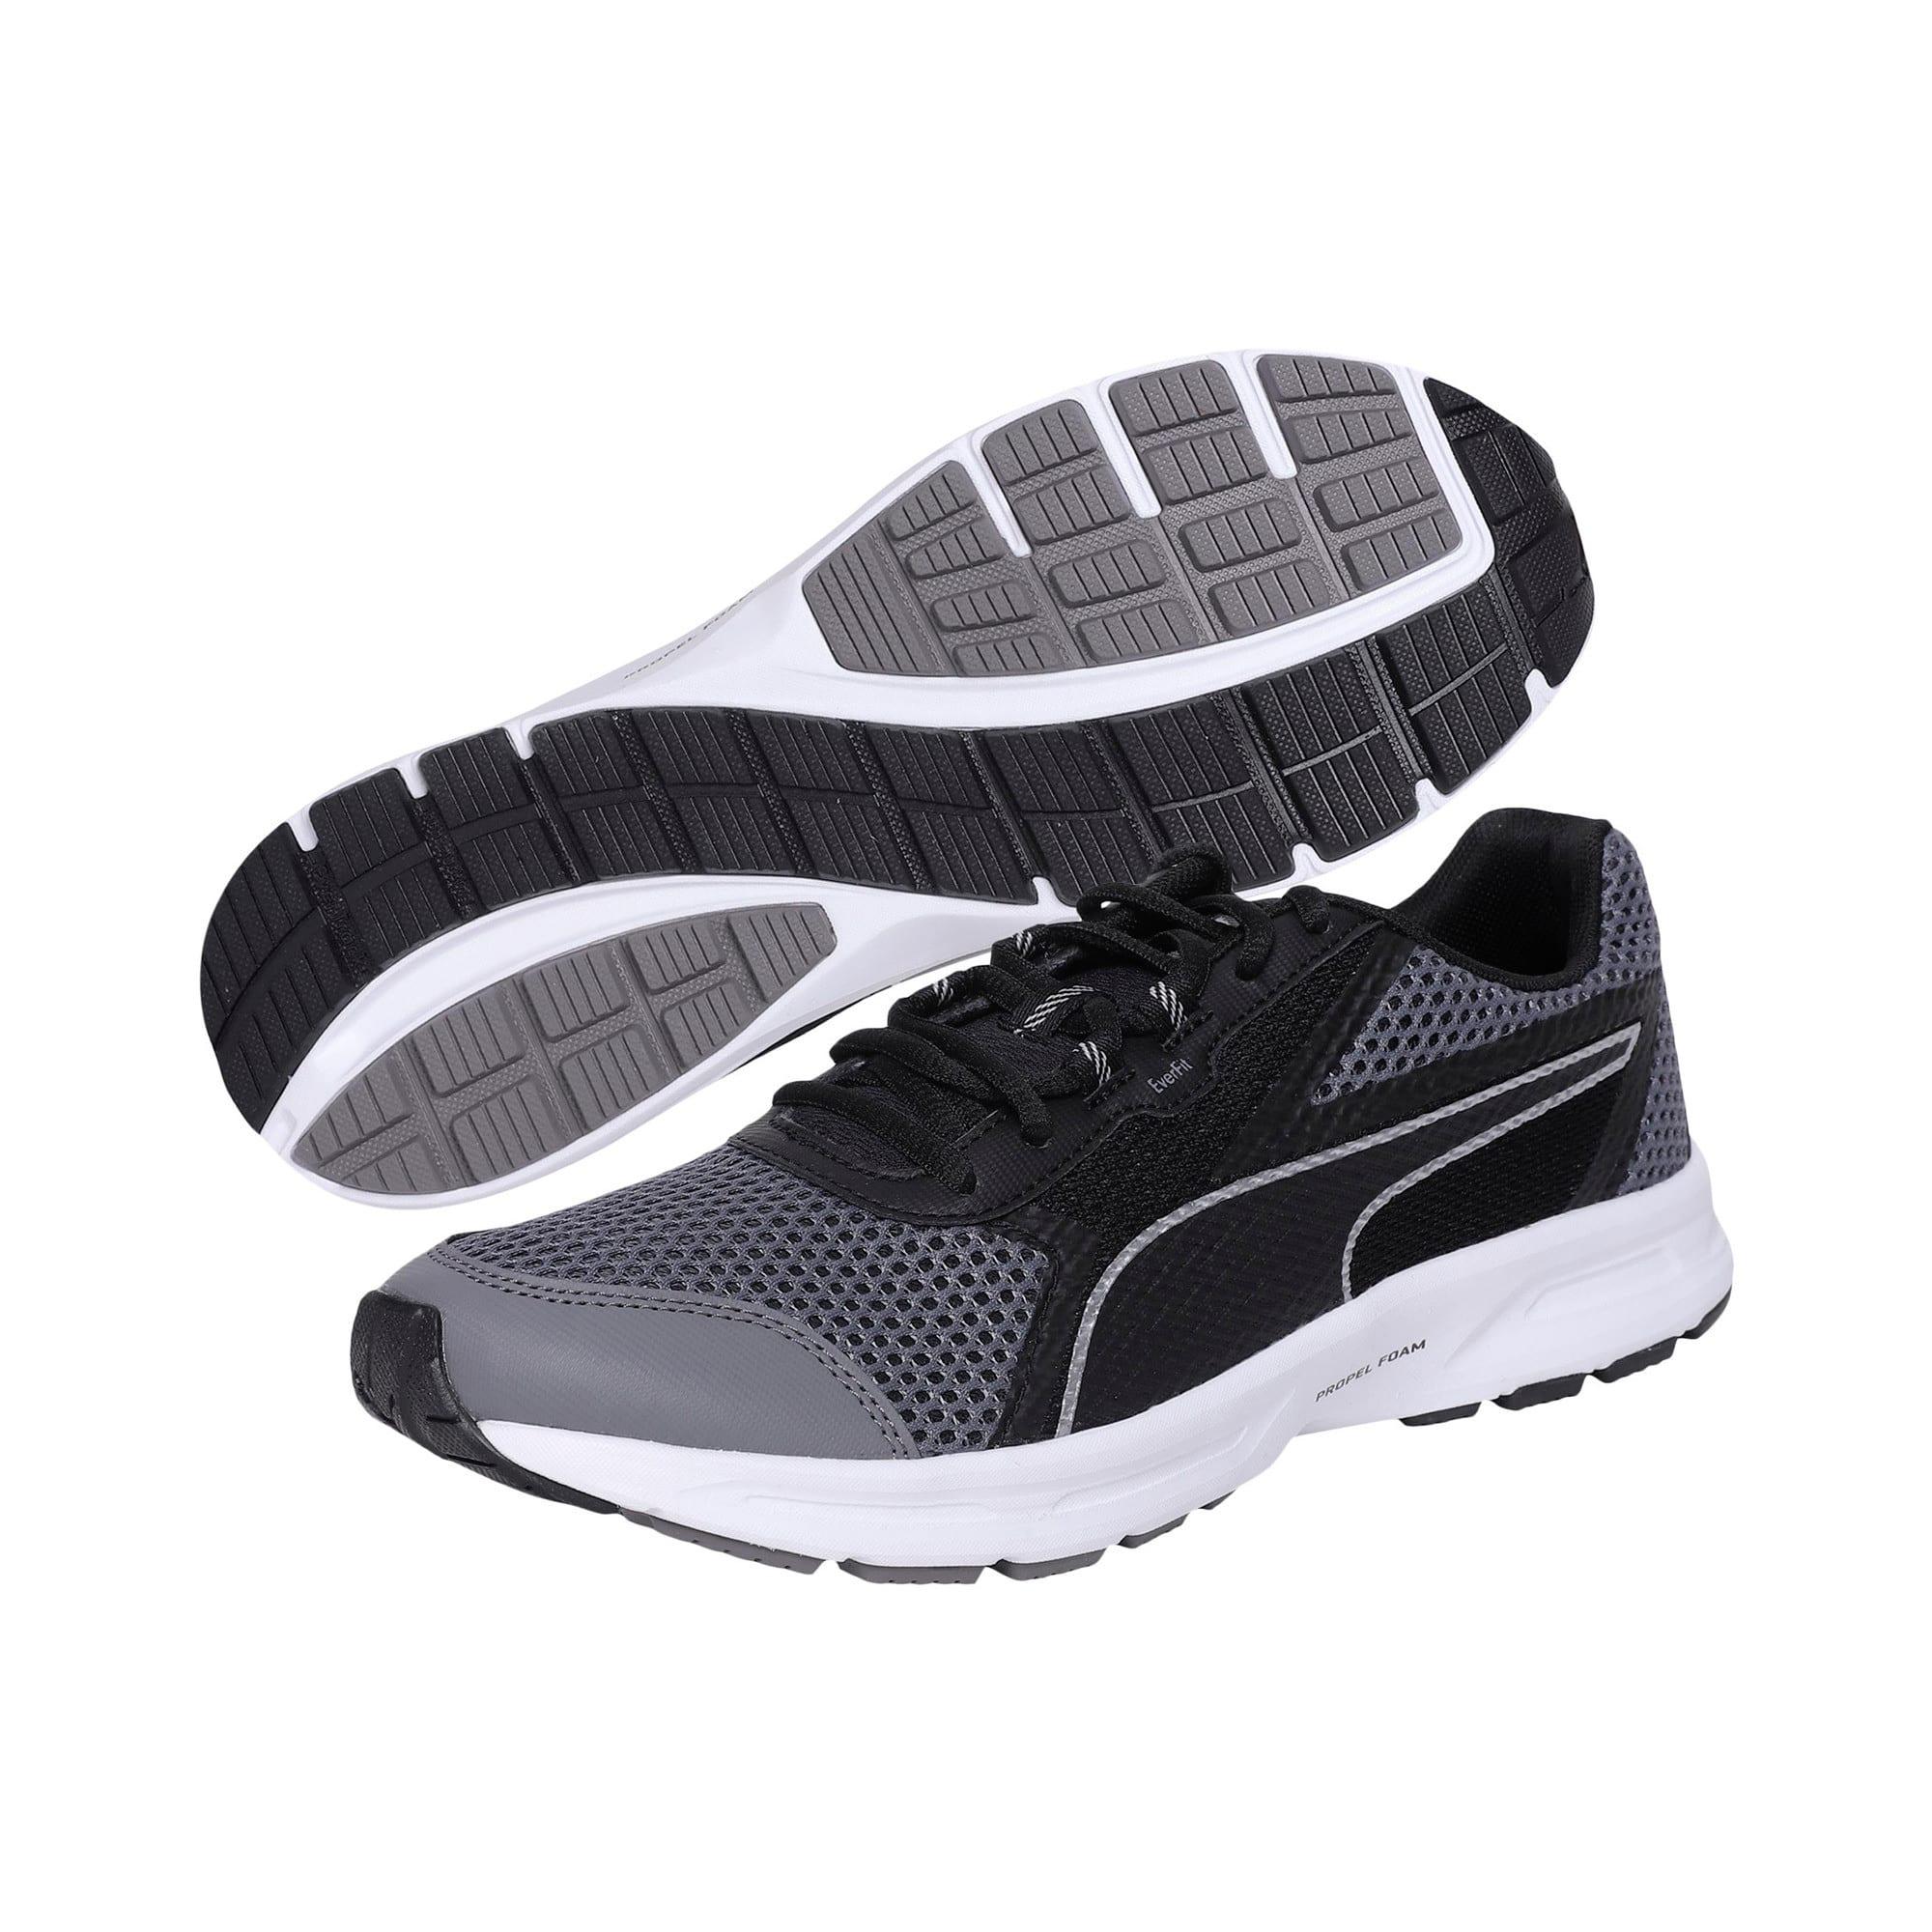 Thumbnail 2 of Essential Runner Men's Running Shoes, QUIET SHADE-Black-Silver, medium-IND